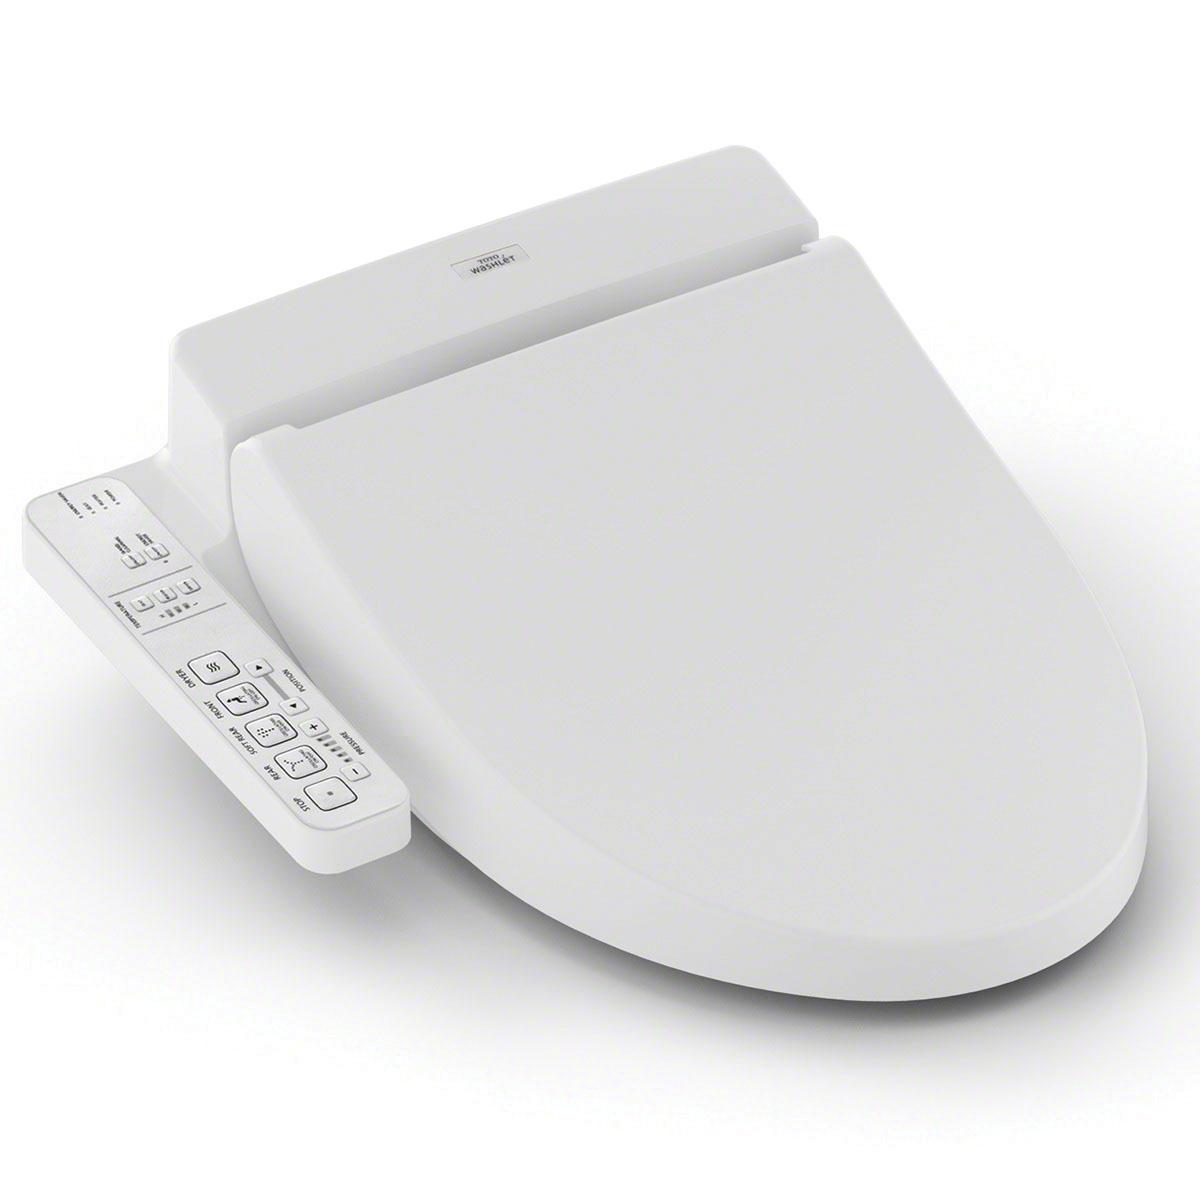 Toto® SW2033R#01 WASHLET® C100 Electronic Bidet Toilet Seat, Round Bowl, Closed Front, Plastic, Cotton White, SoftClose® Hinge, Import